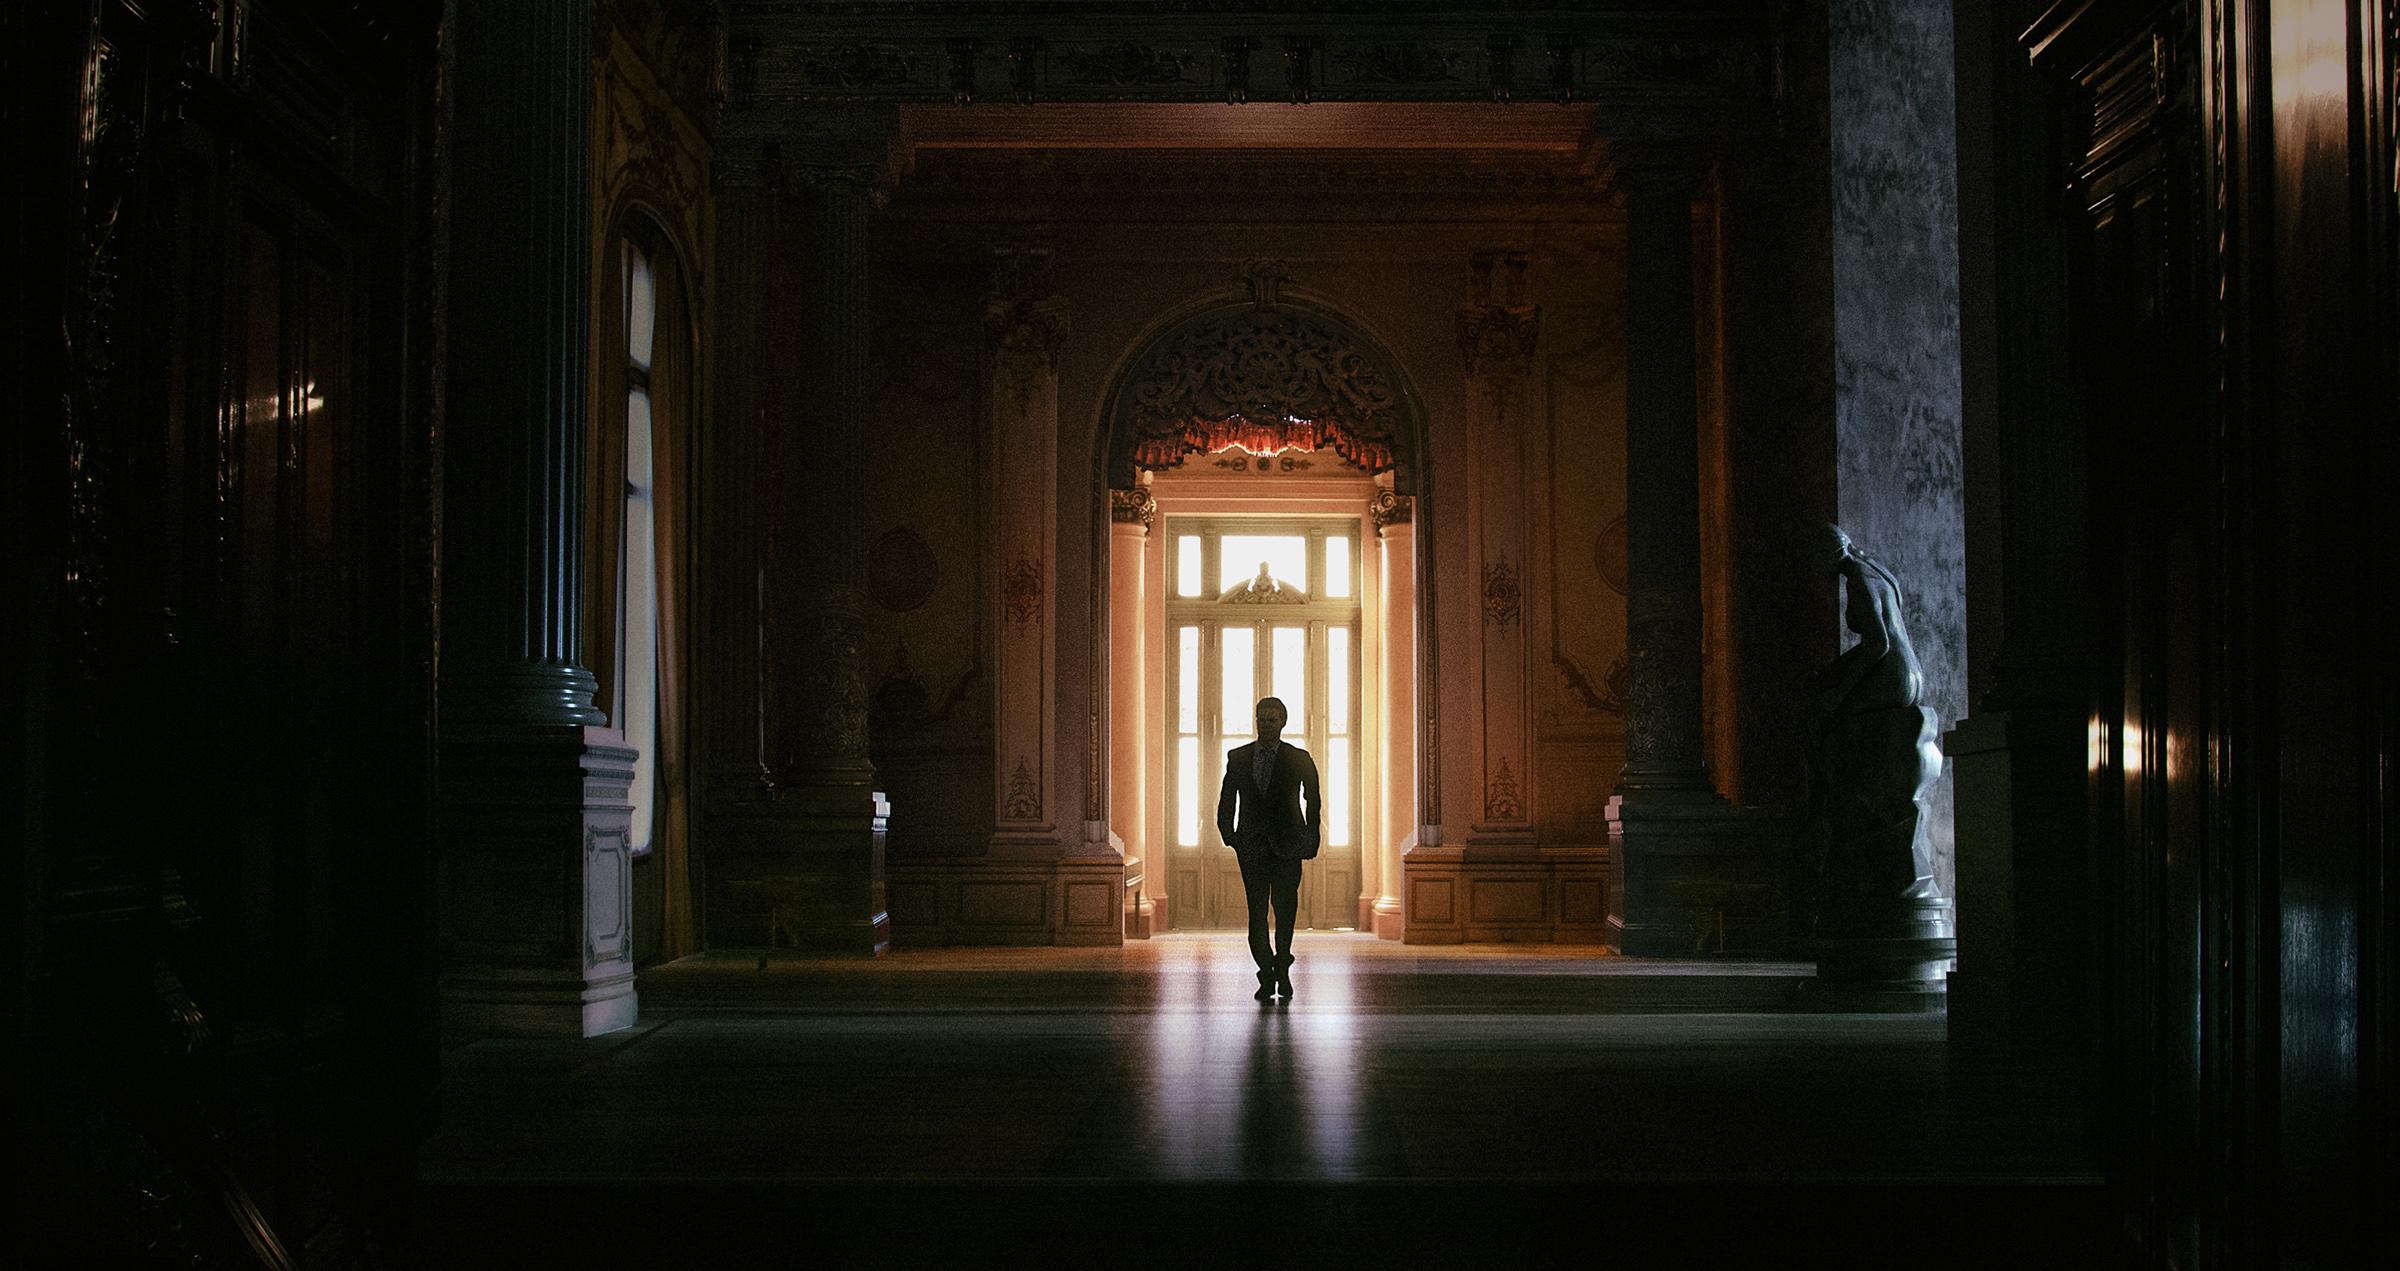 Martin_Faragasso_Cinematic_b.jpg